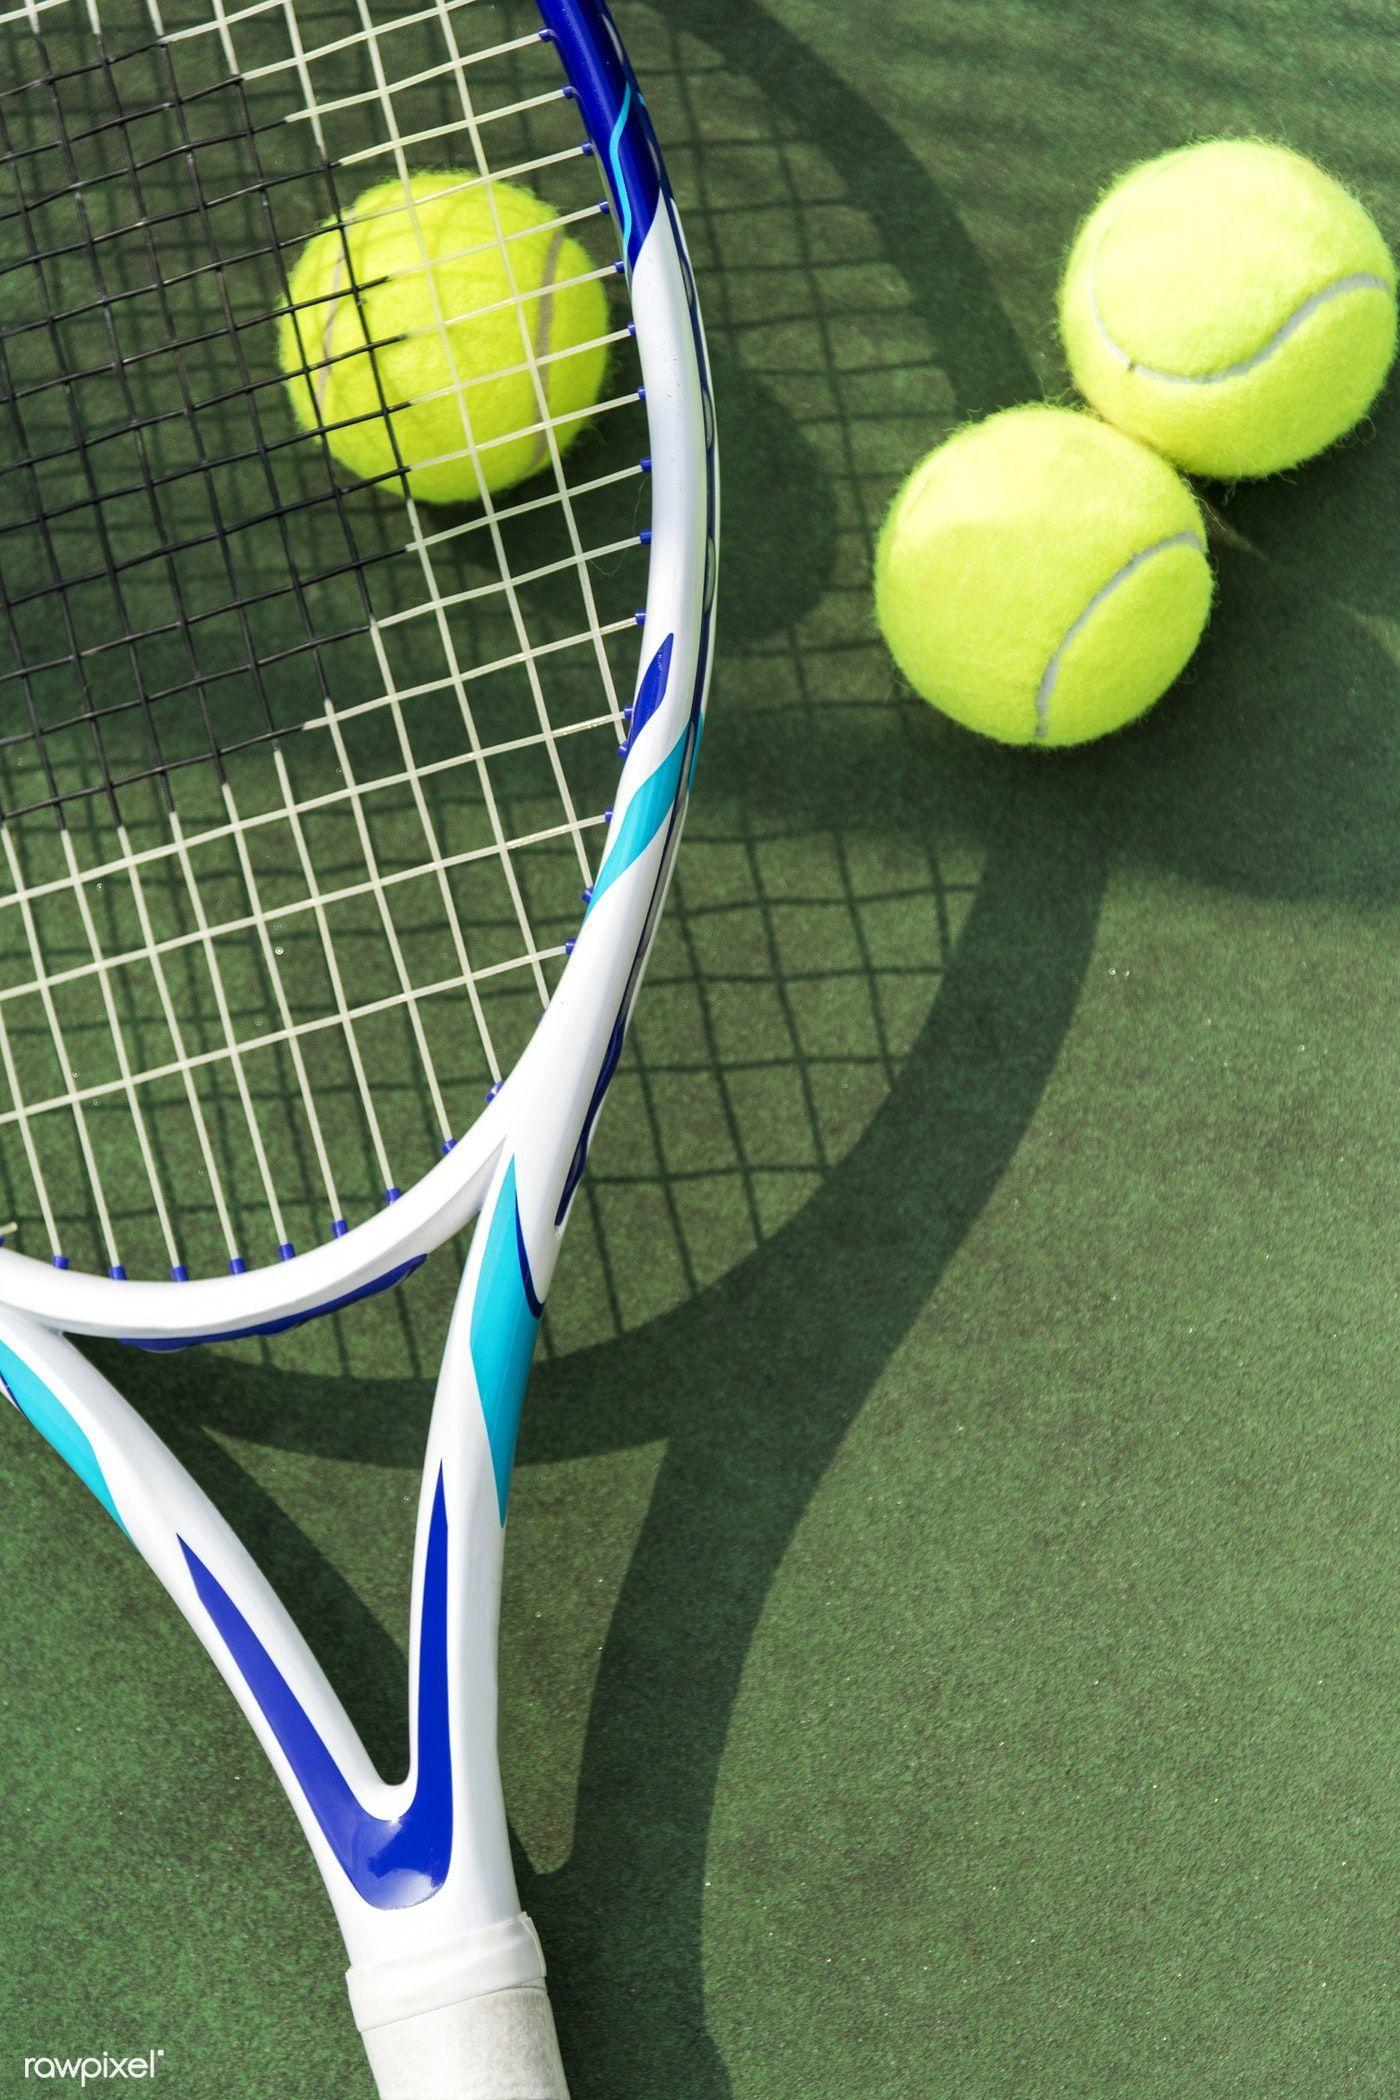 Download Premium Image Of Tennis Balls On A Tennis Court 413593 In 2020 Tennis Balls Tennis Court Tennis